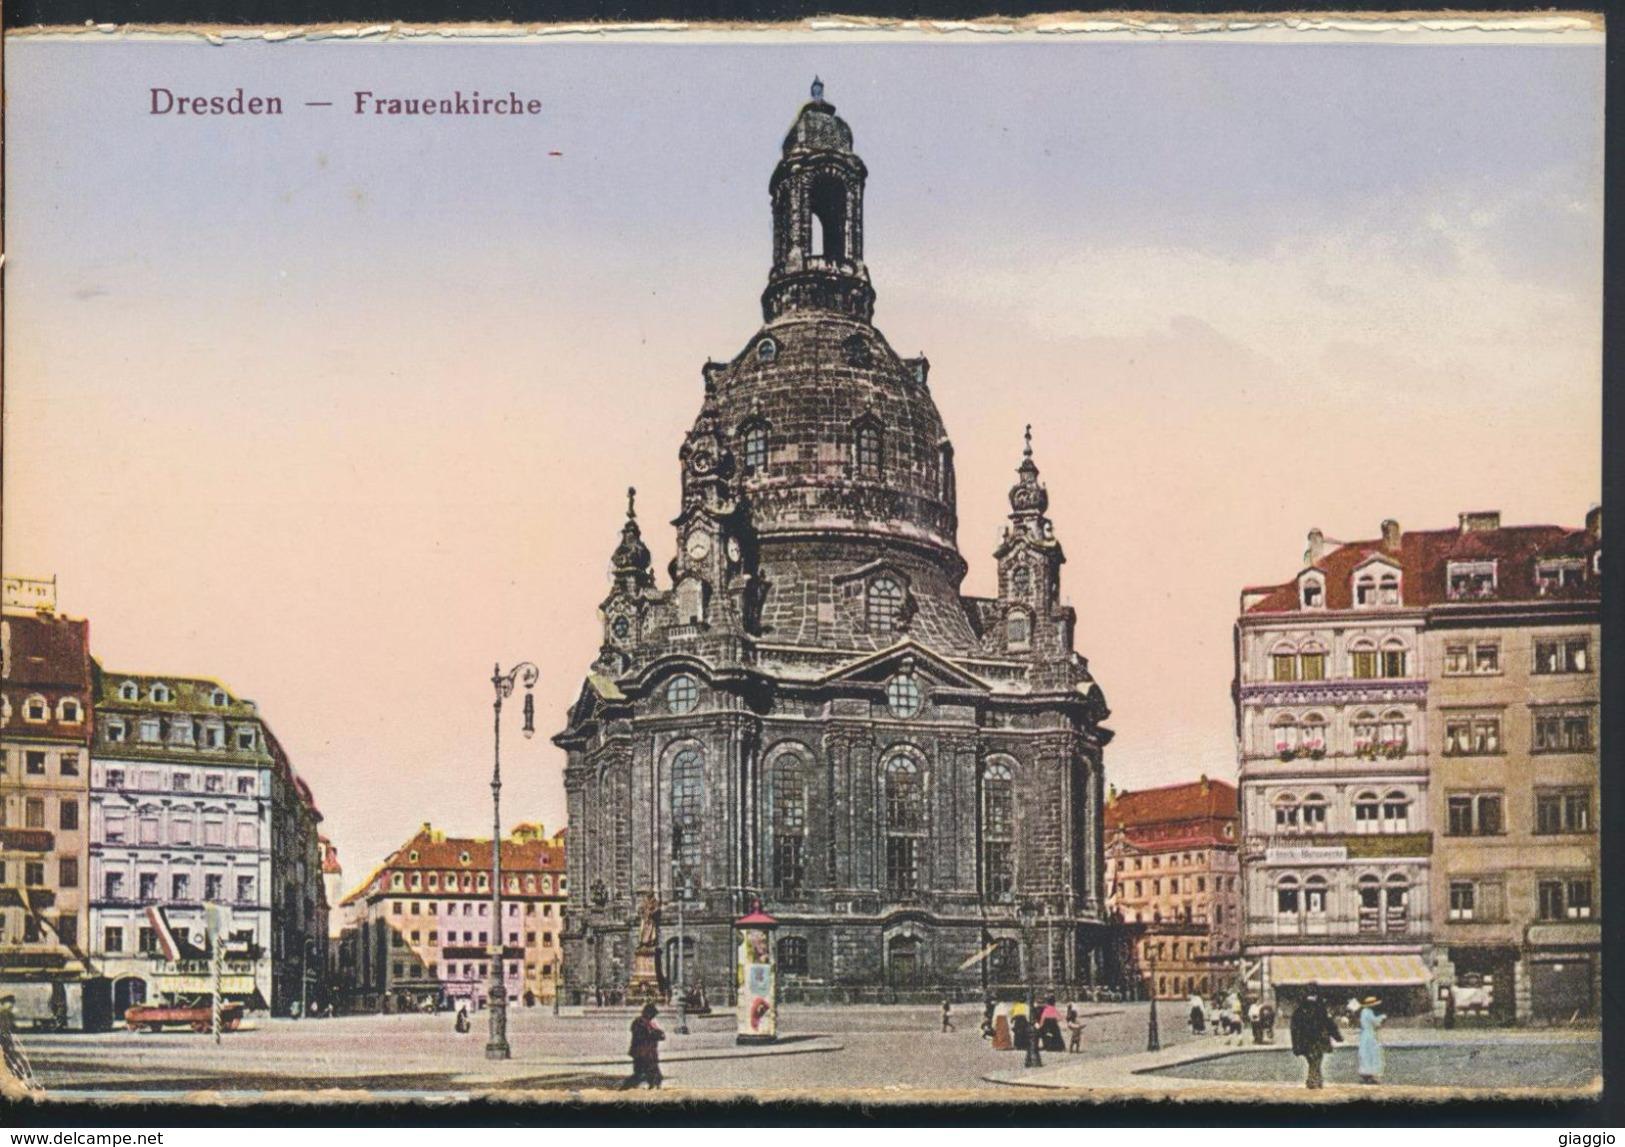 °°° 5057 - GERMANY - DRESDEN - FRAUENKIRCHE °°° - Dresden